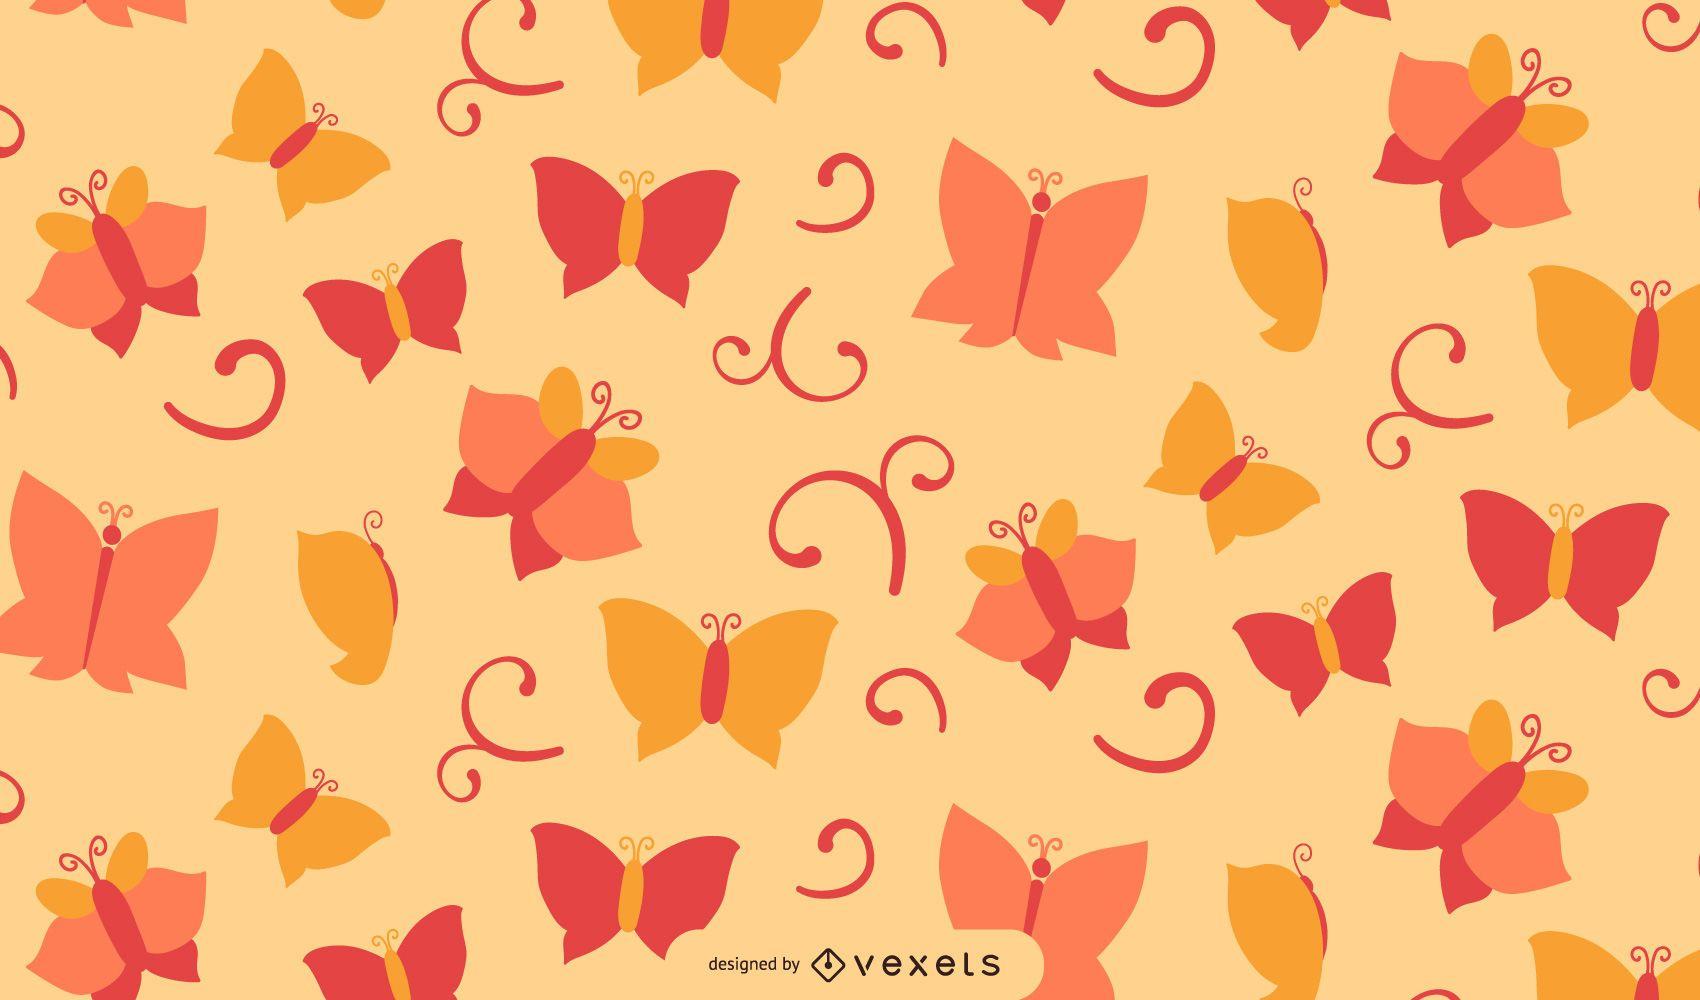 Flouring Swirls Butterfly Background